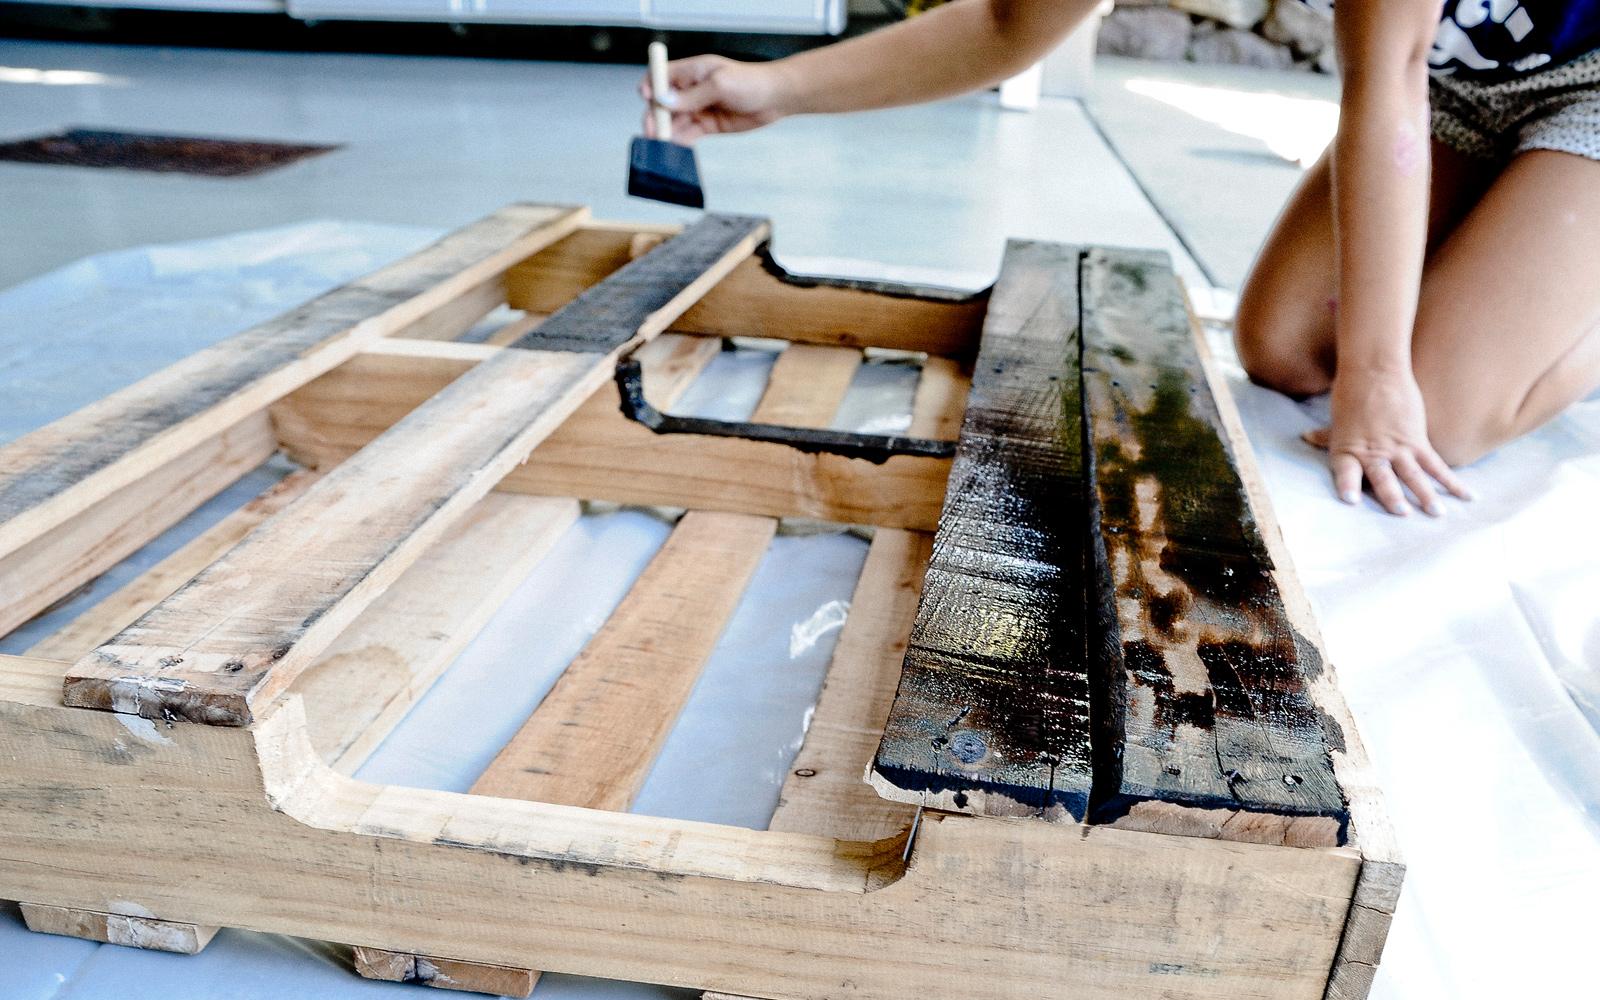 staining coat rack diy